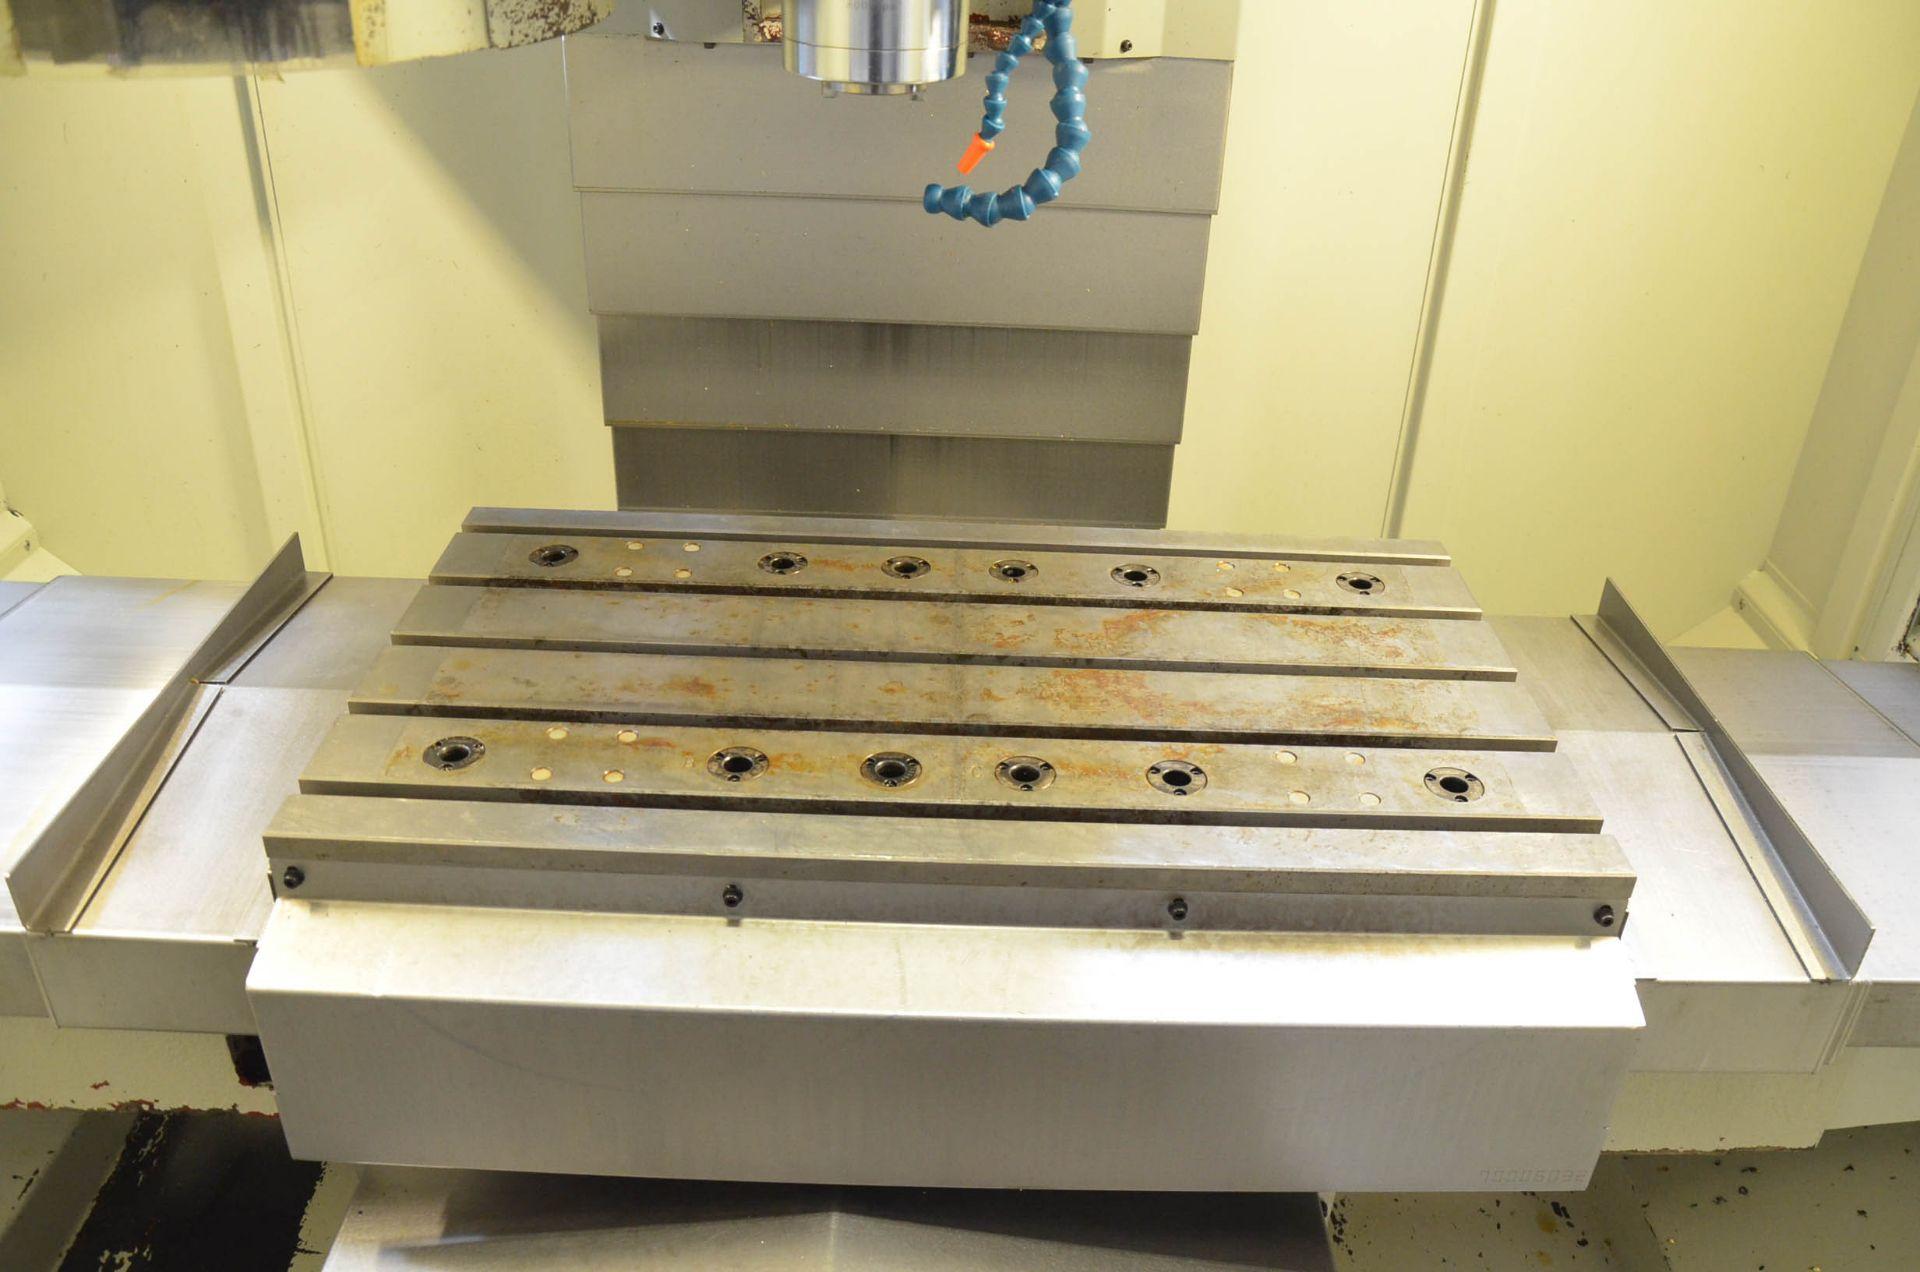 SWI (2014) TRAK LPM 4-AXIS READY CNC VERTICAL MACHINING CENTER WITH PROTO TRAK PMX CNC CONTROL, 19. - Image 8 of 12